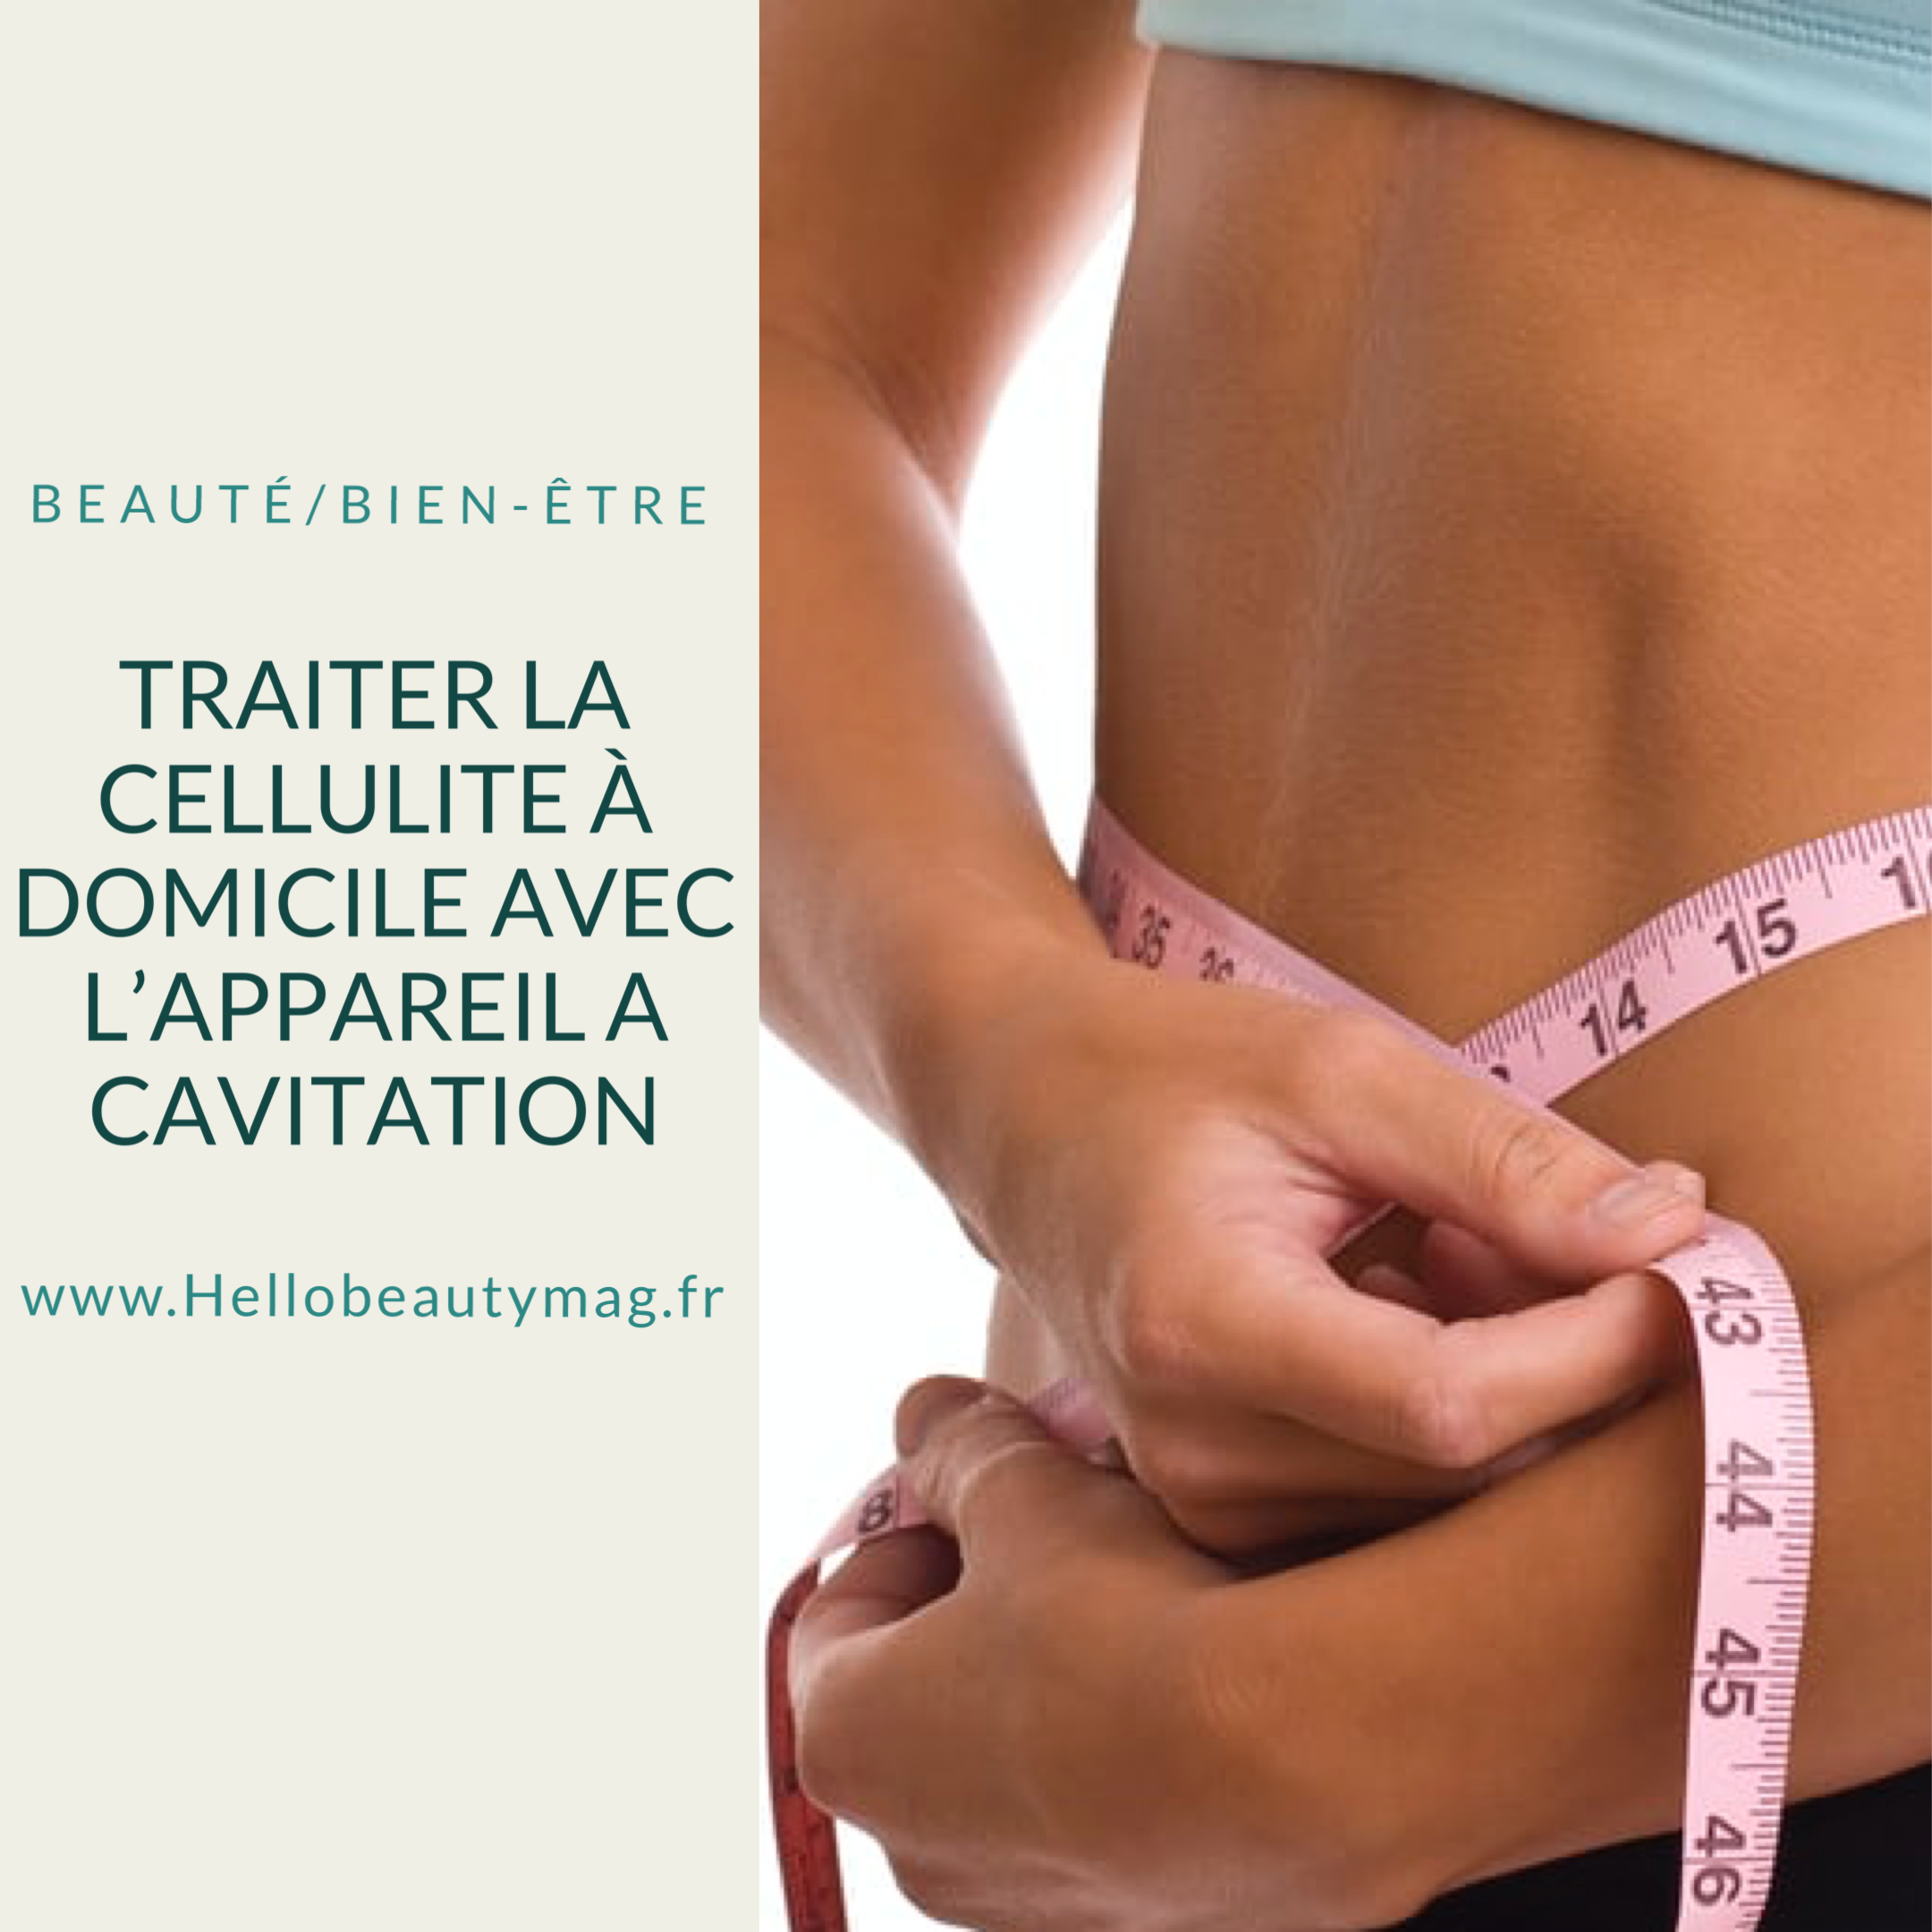 minceur-anti-cellulite-machine-cavitation-ultrason-hautes-frequences-corps-